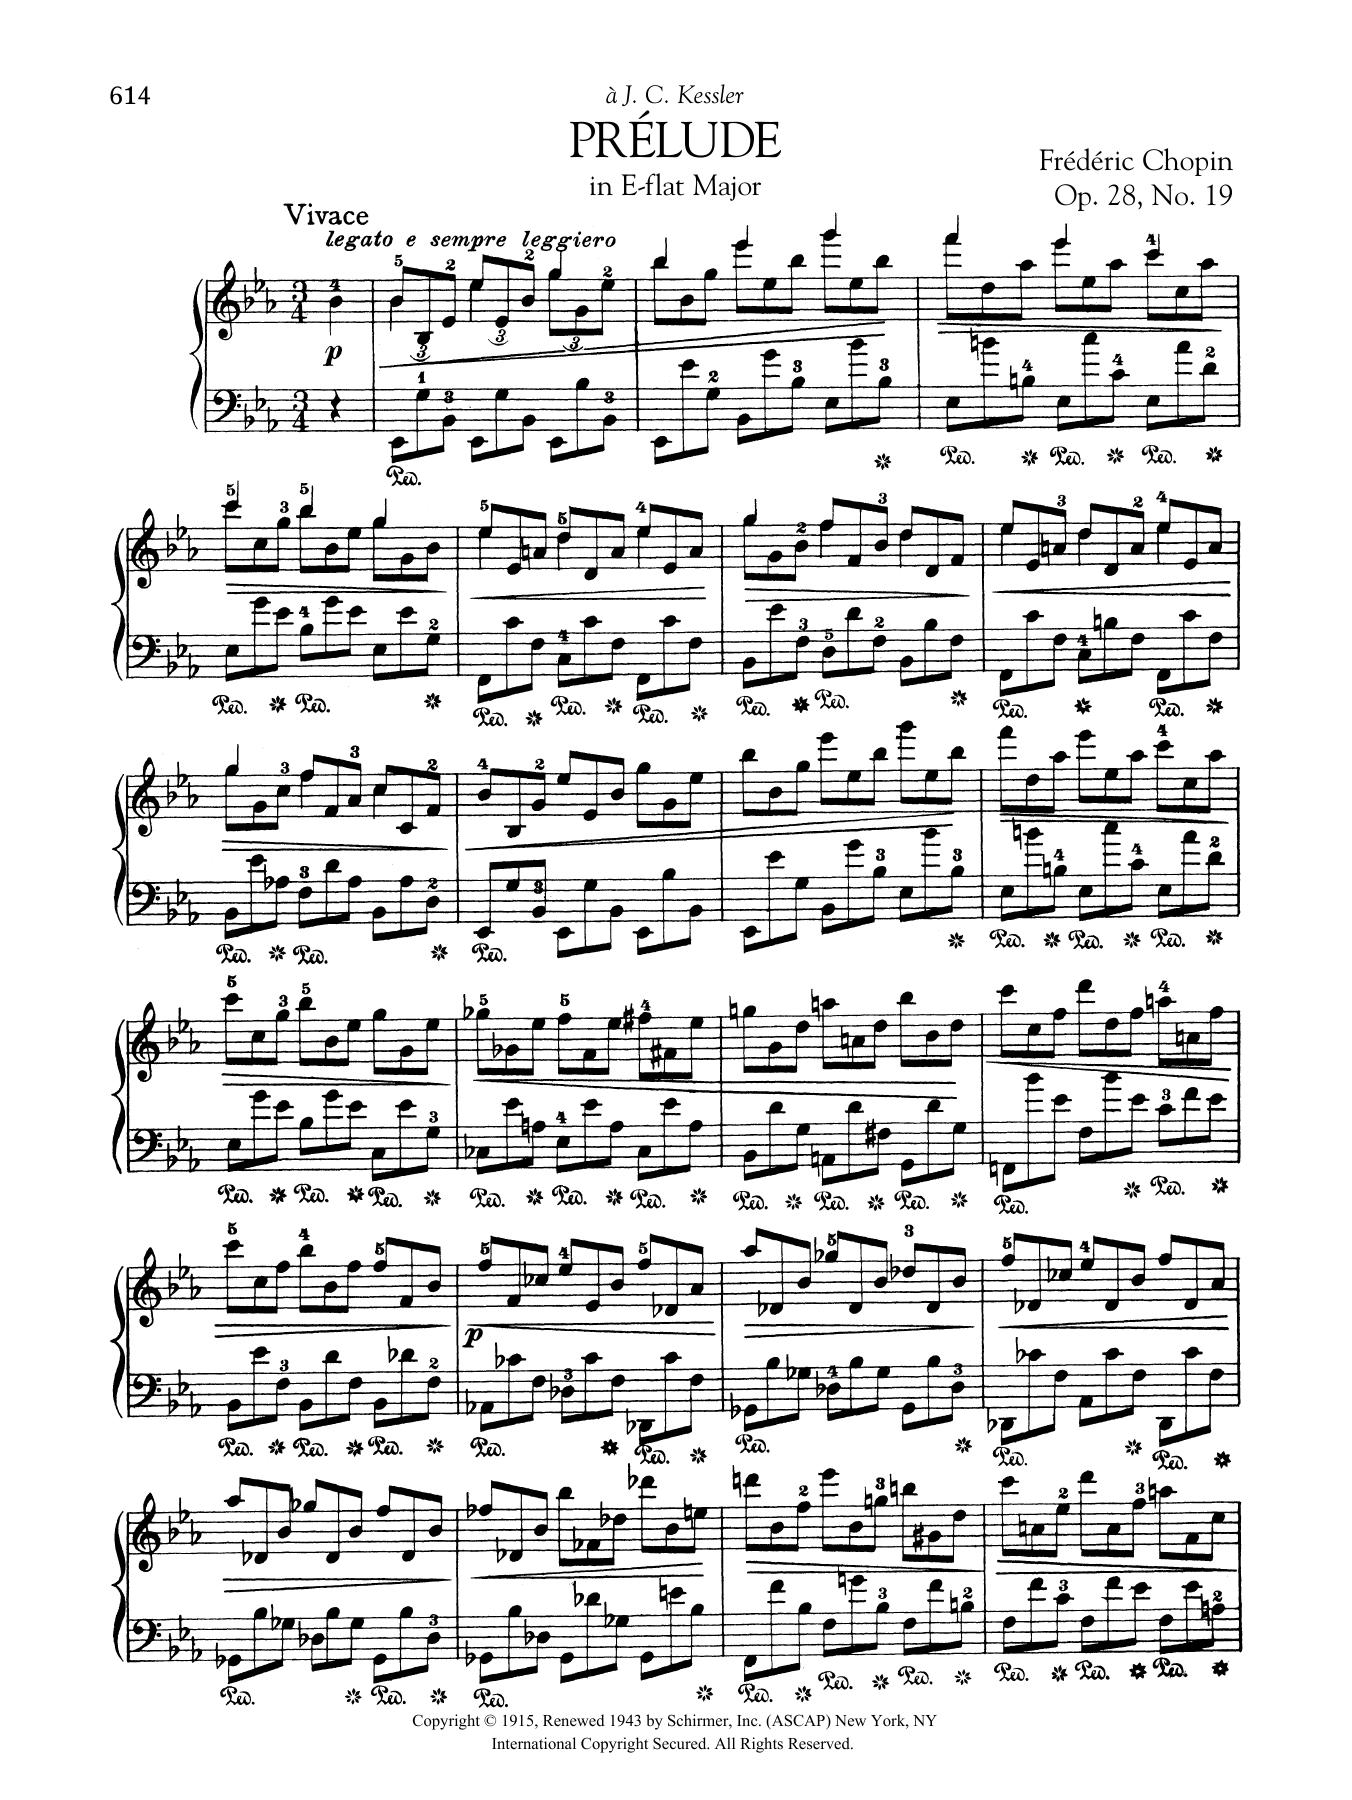 Prélude in E-flat Major, Op. 28, No. 19 Sheet Music